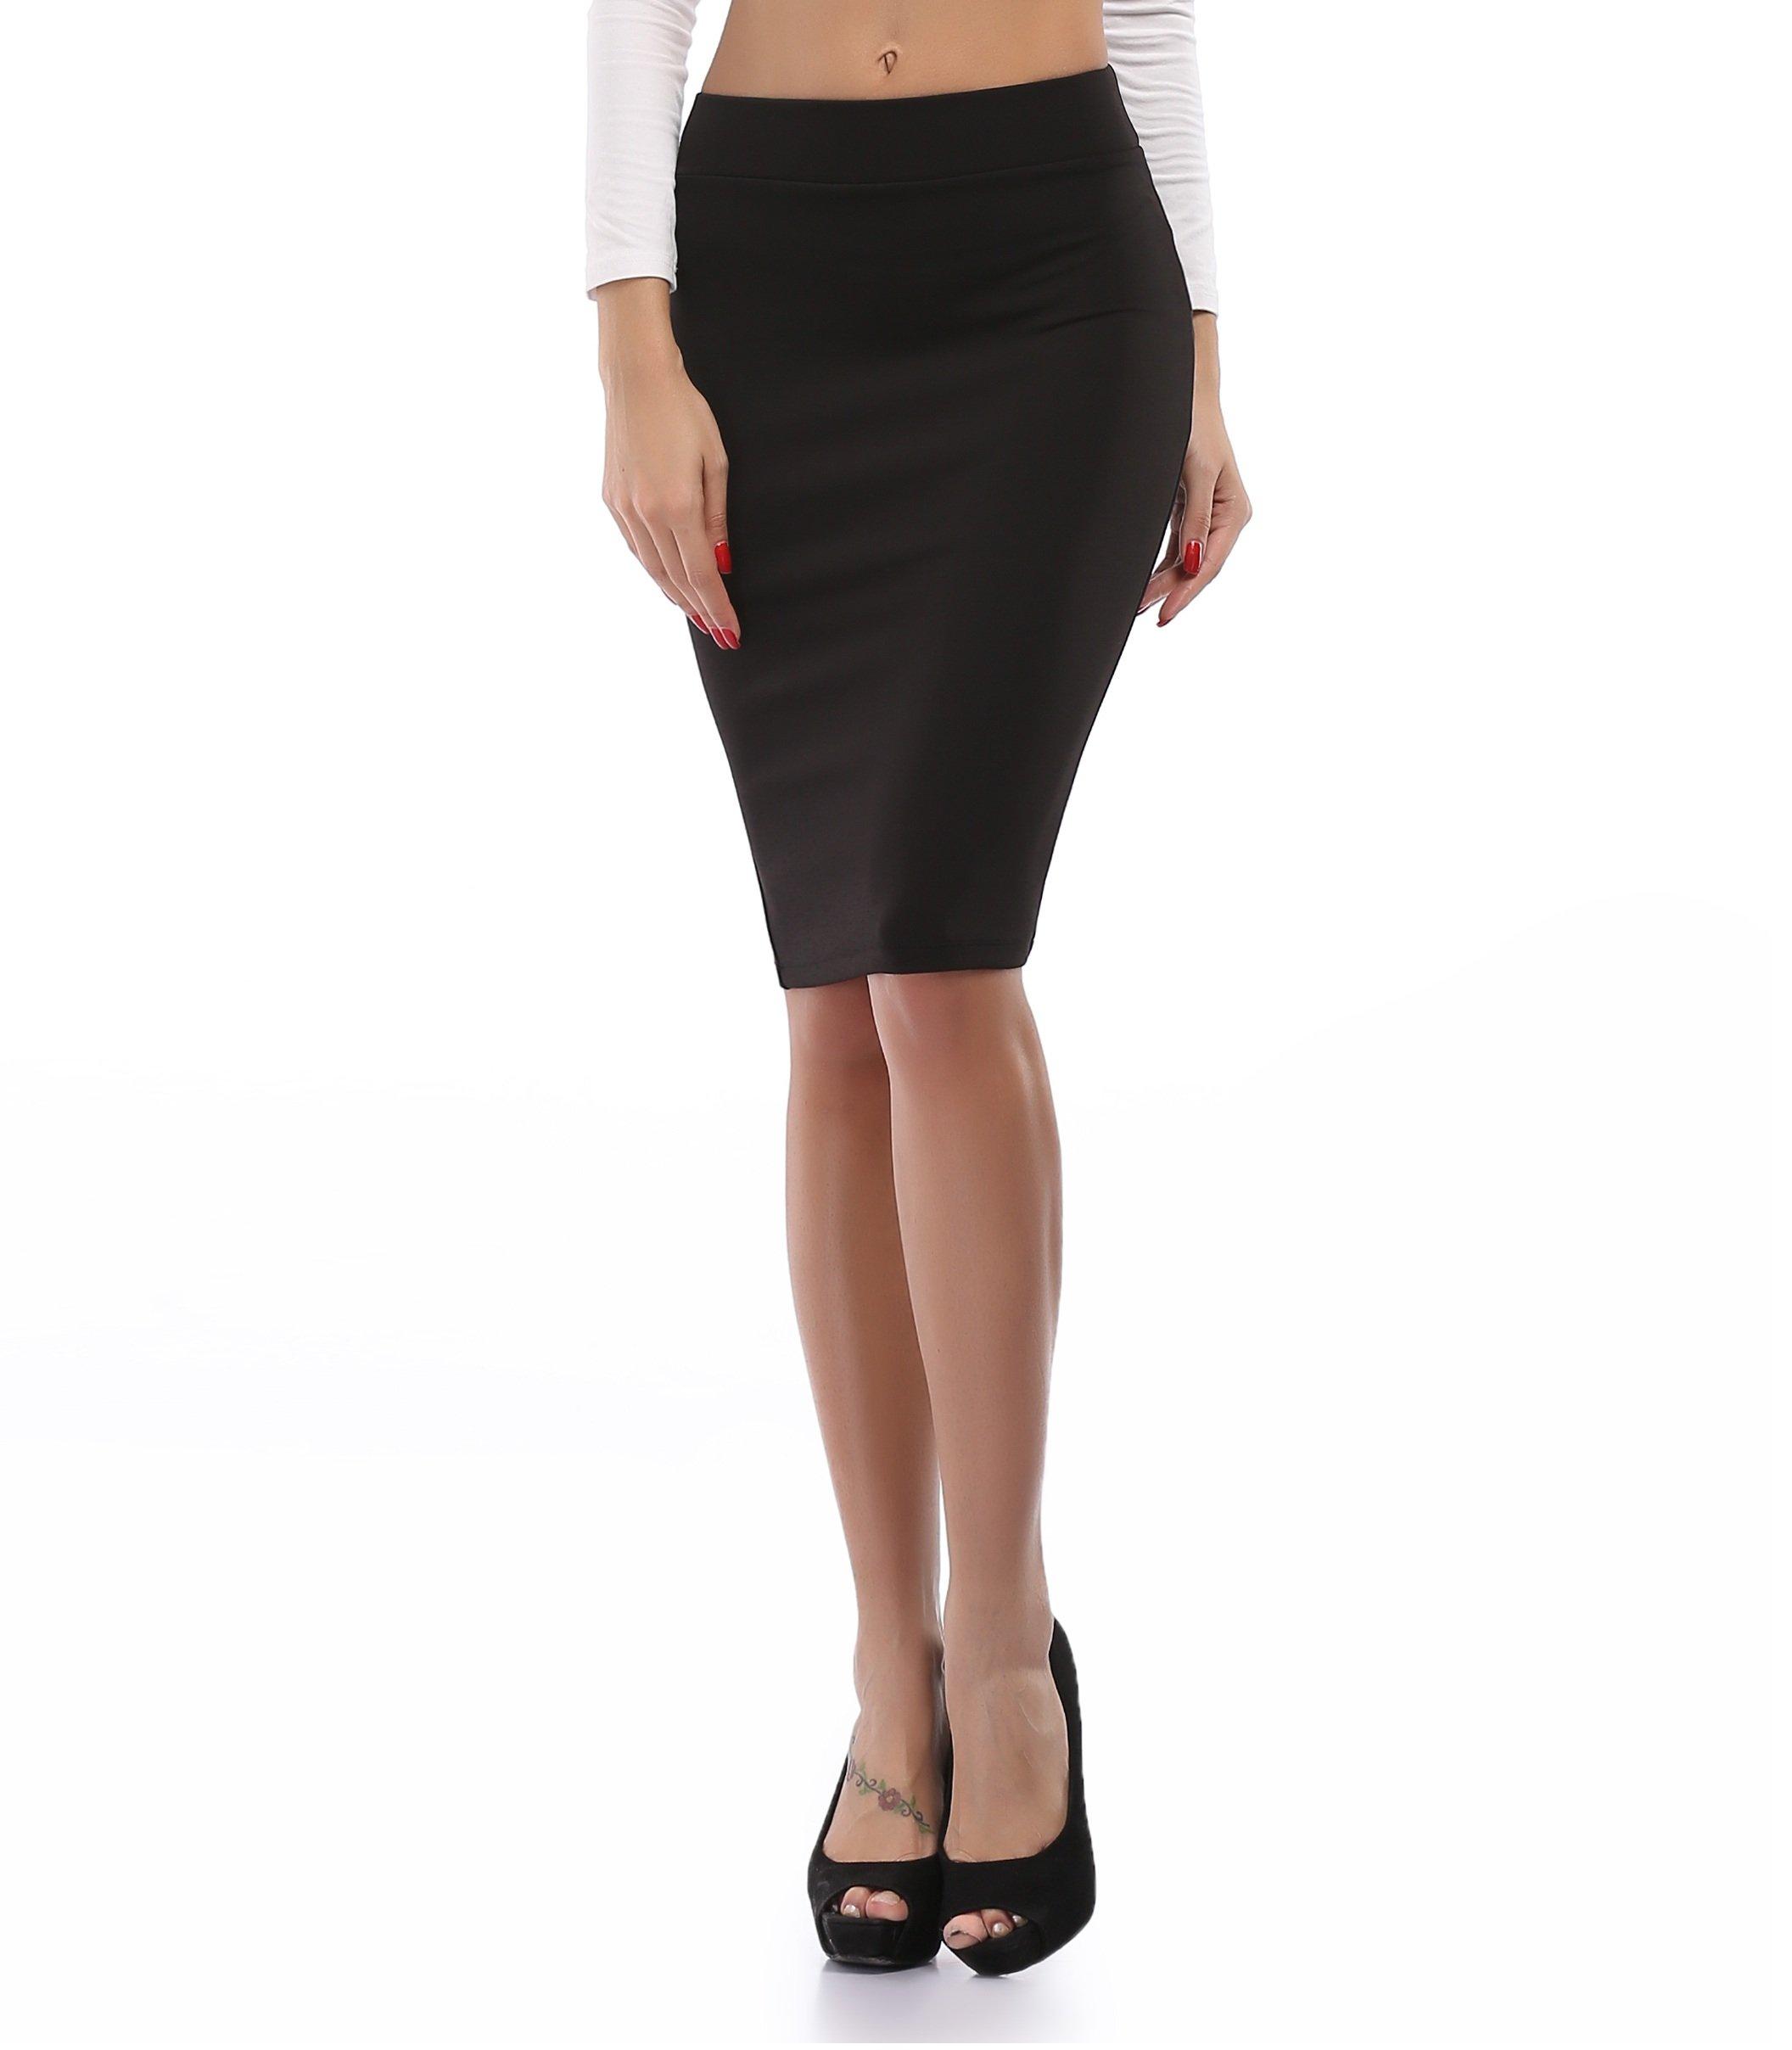 Women's Stretch High Waist Mini Skirt Pencil Skirt Short Dress Stretchy Fabric,Black,Small